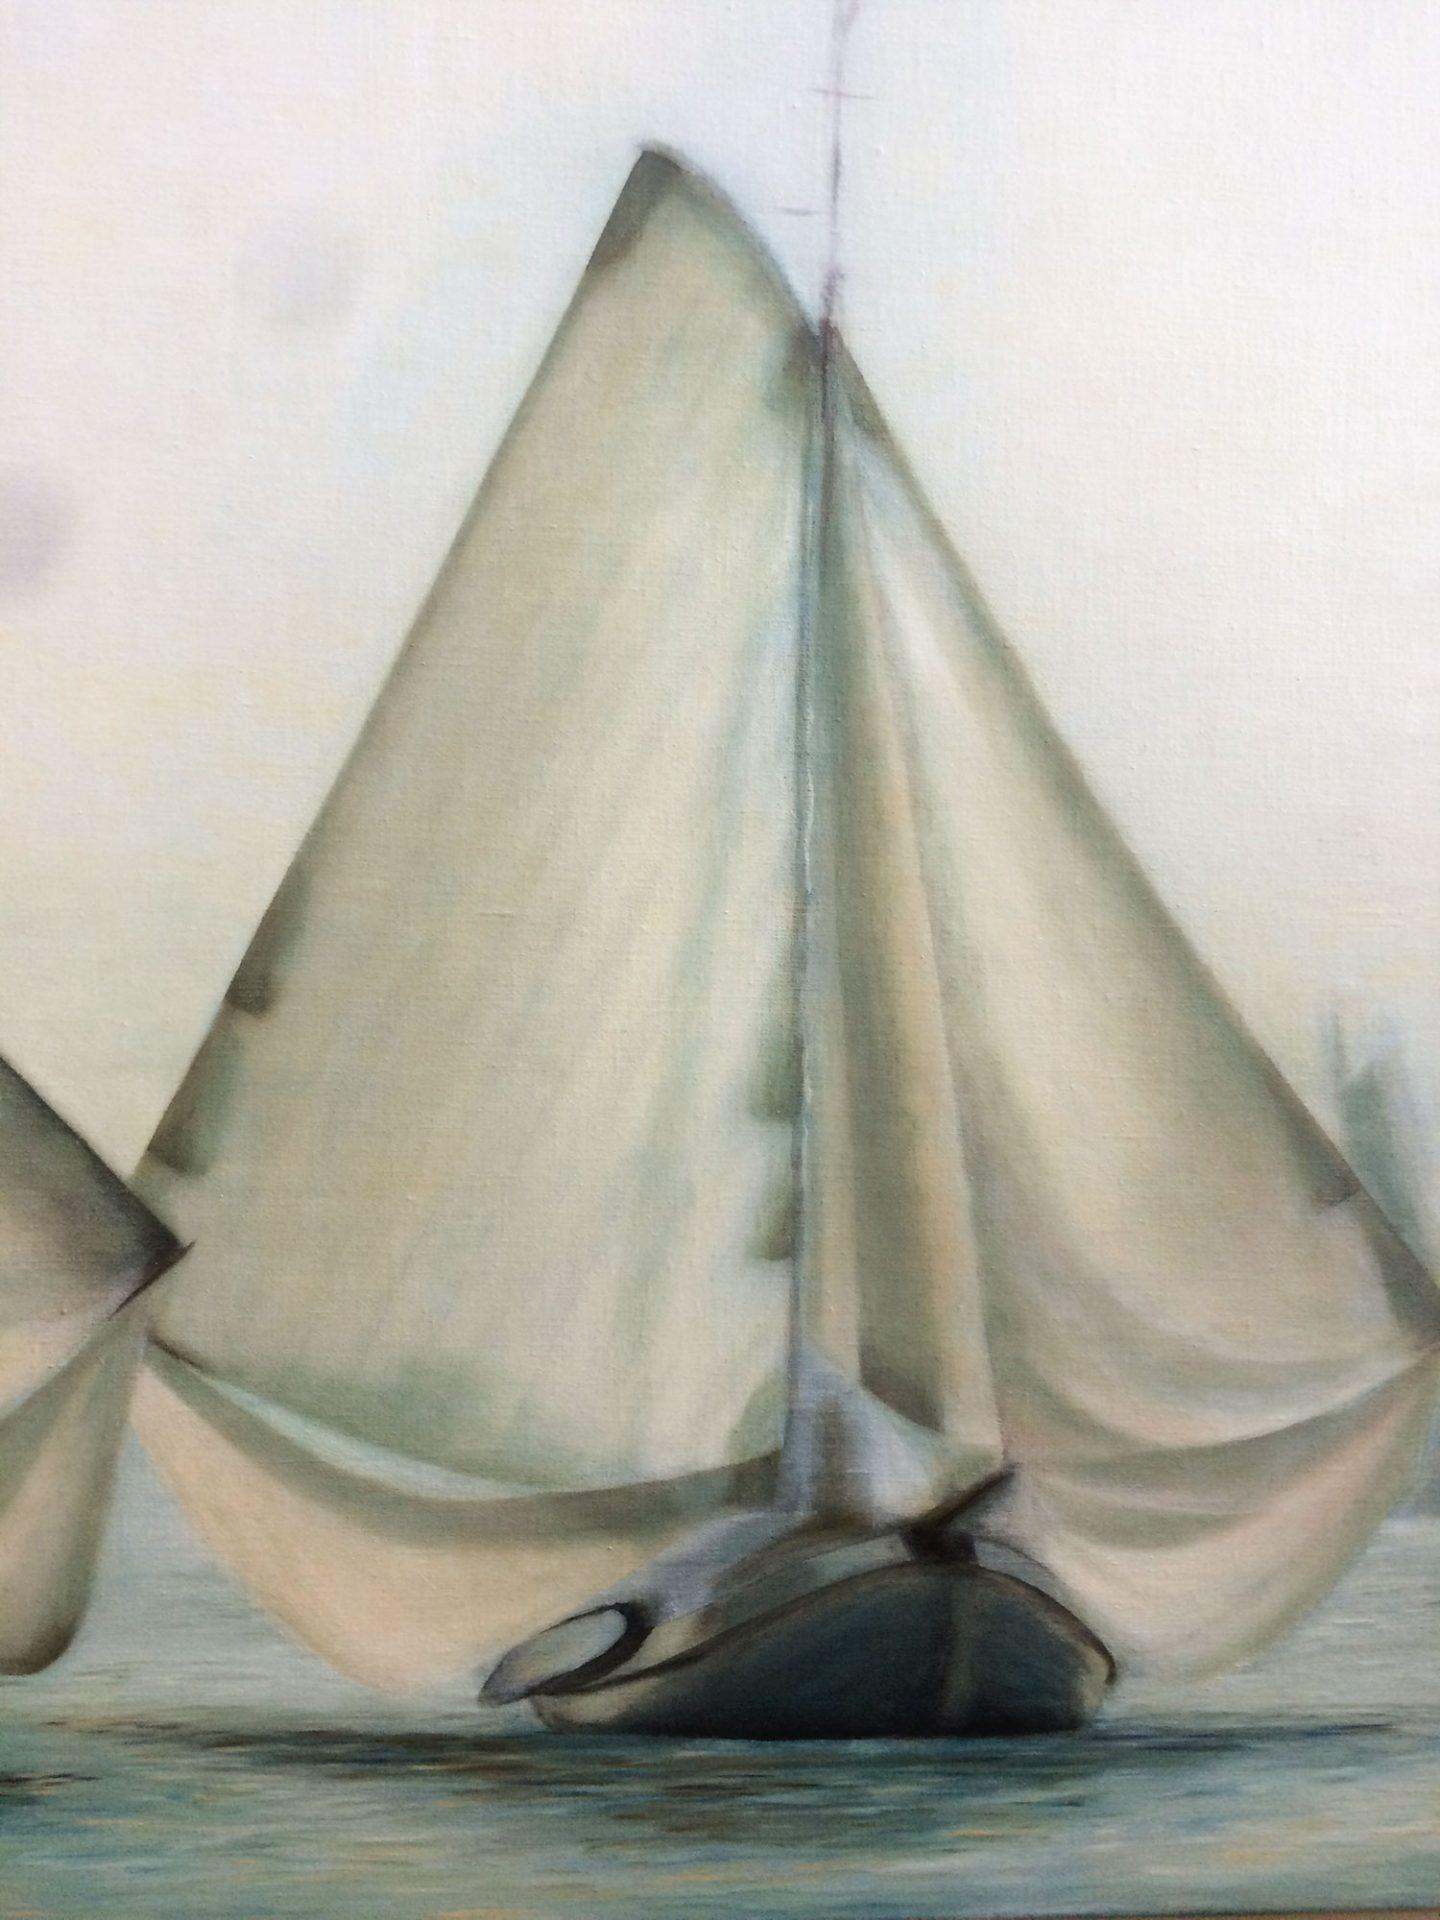 Wind stillness - Hazy World, Anna van Oel